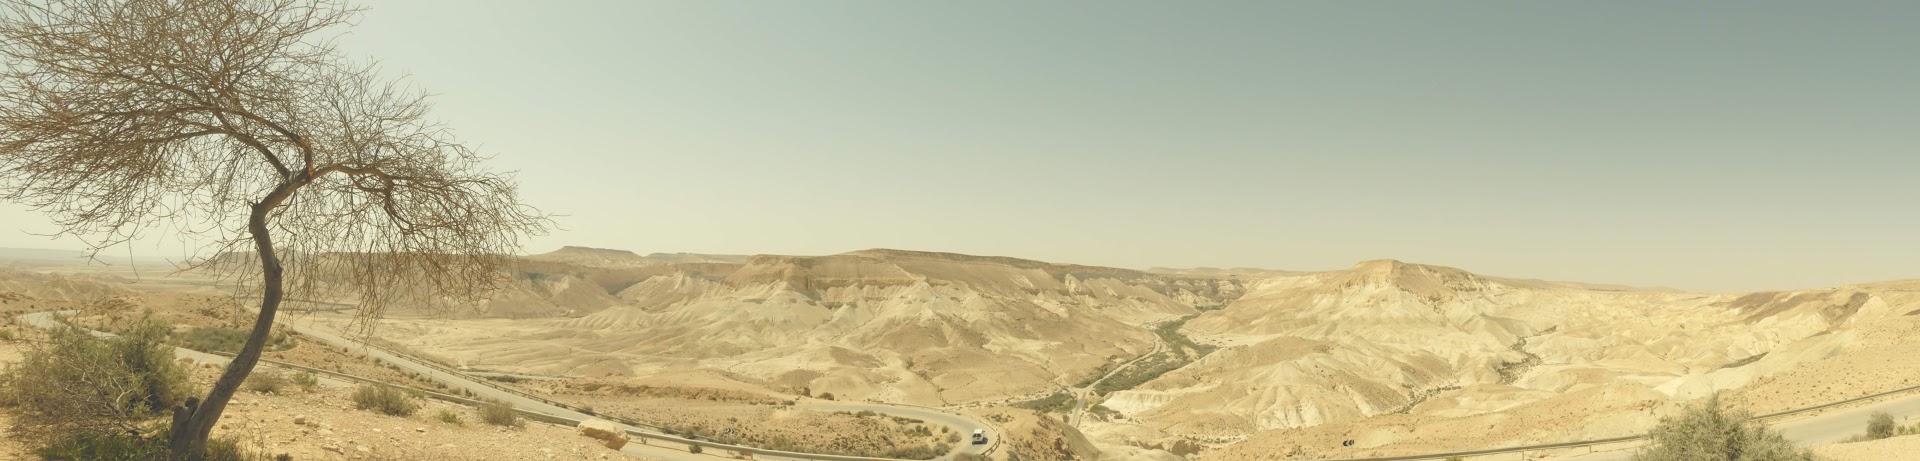 Negev Desert, Israel. [Image: Ruth Wilson, 2019]